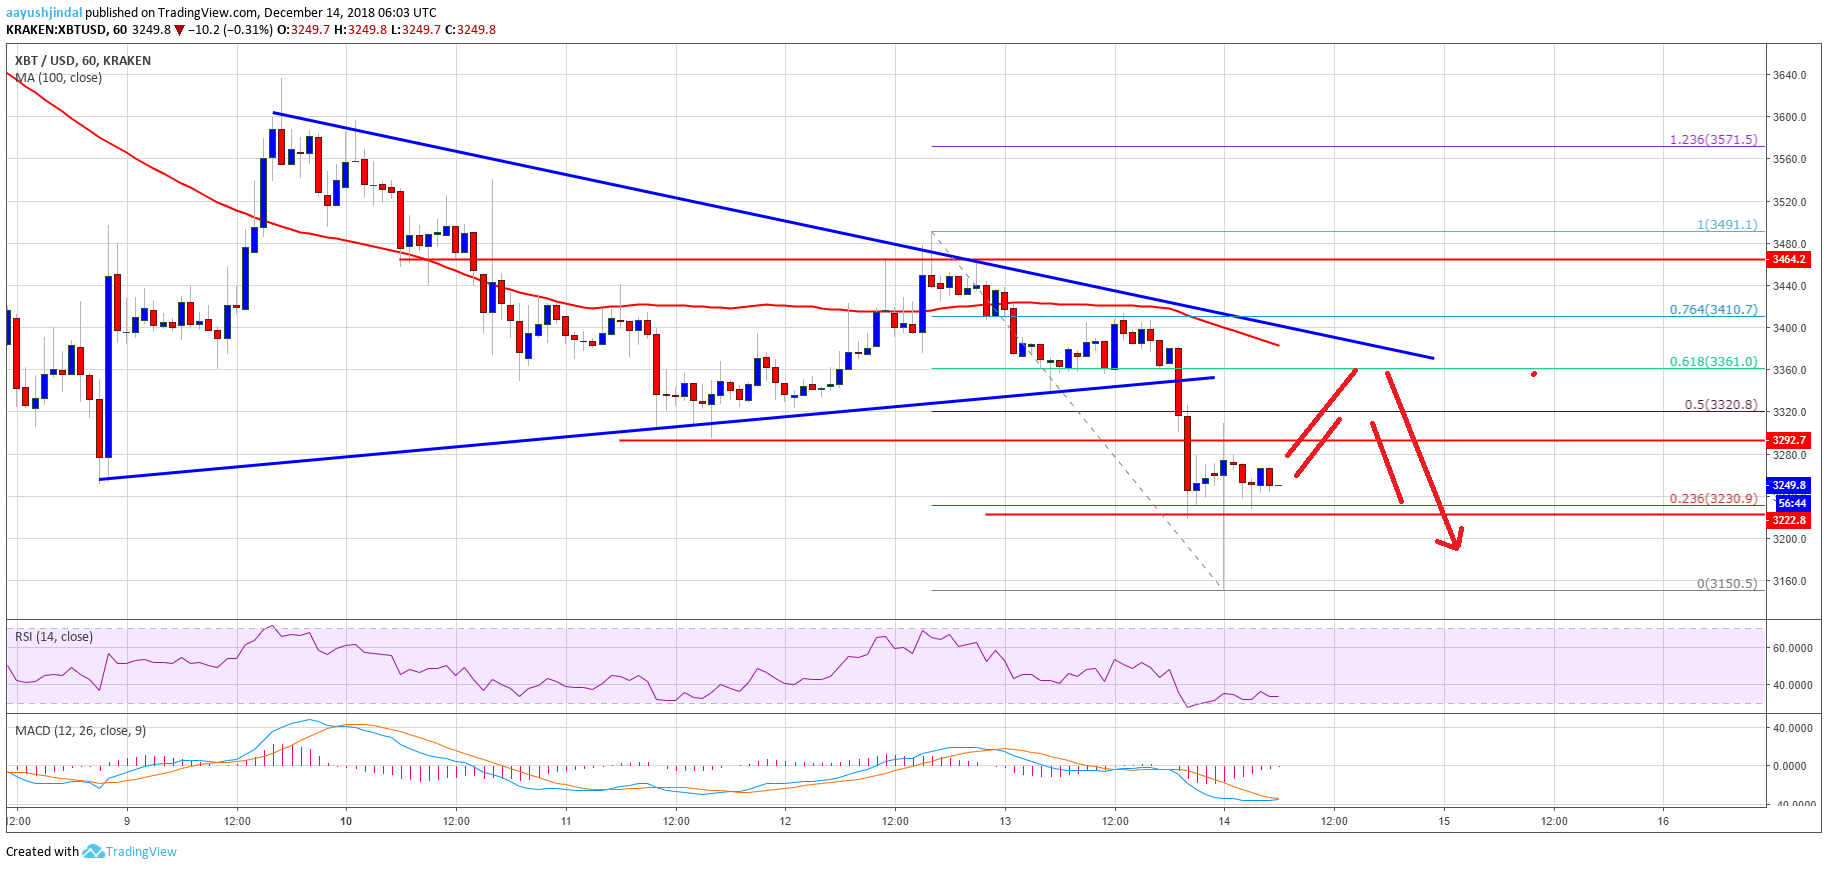 Bitcoin Price Analysis BTC Chart  - Bitcoin 11 - Bitcoin Price Watch: BTC Sellers Target Breakdown Below $3,000